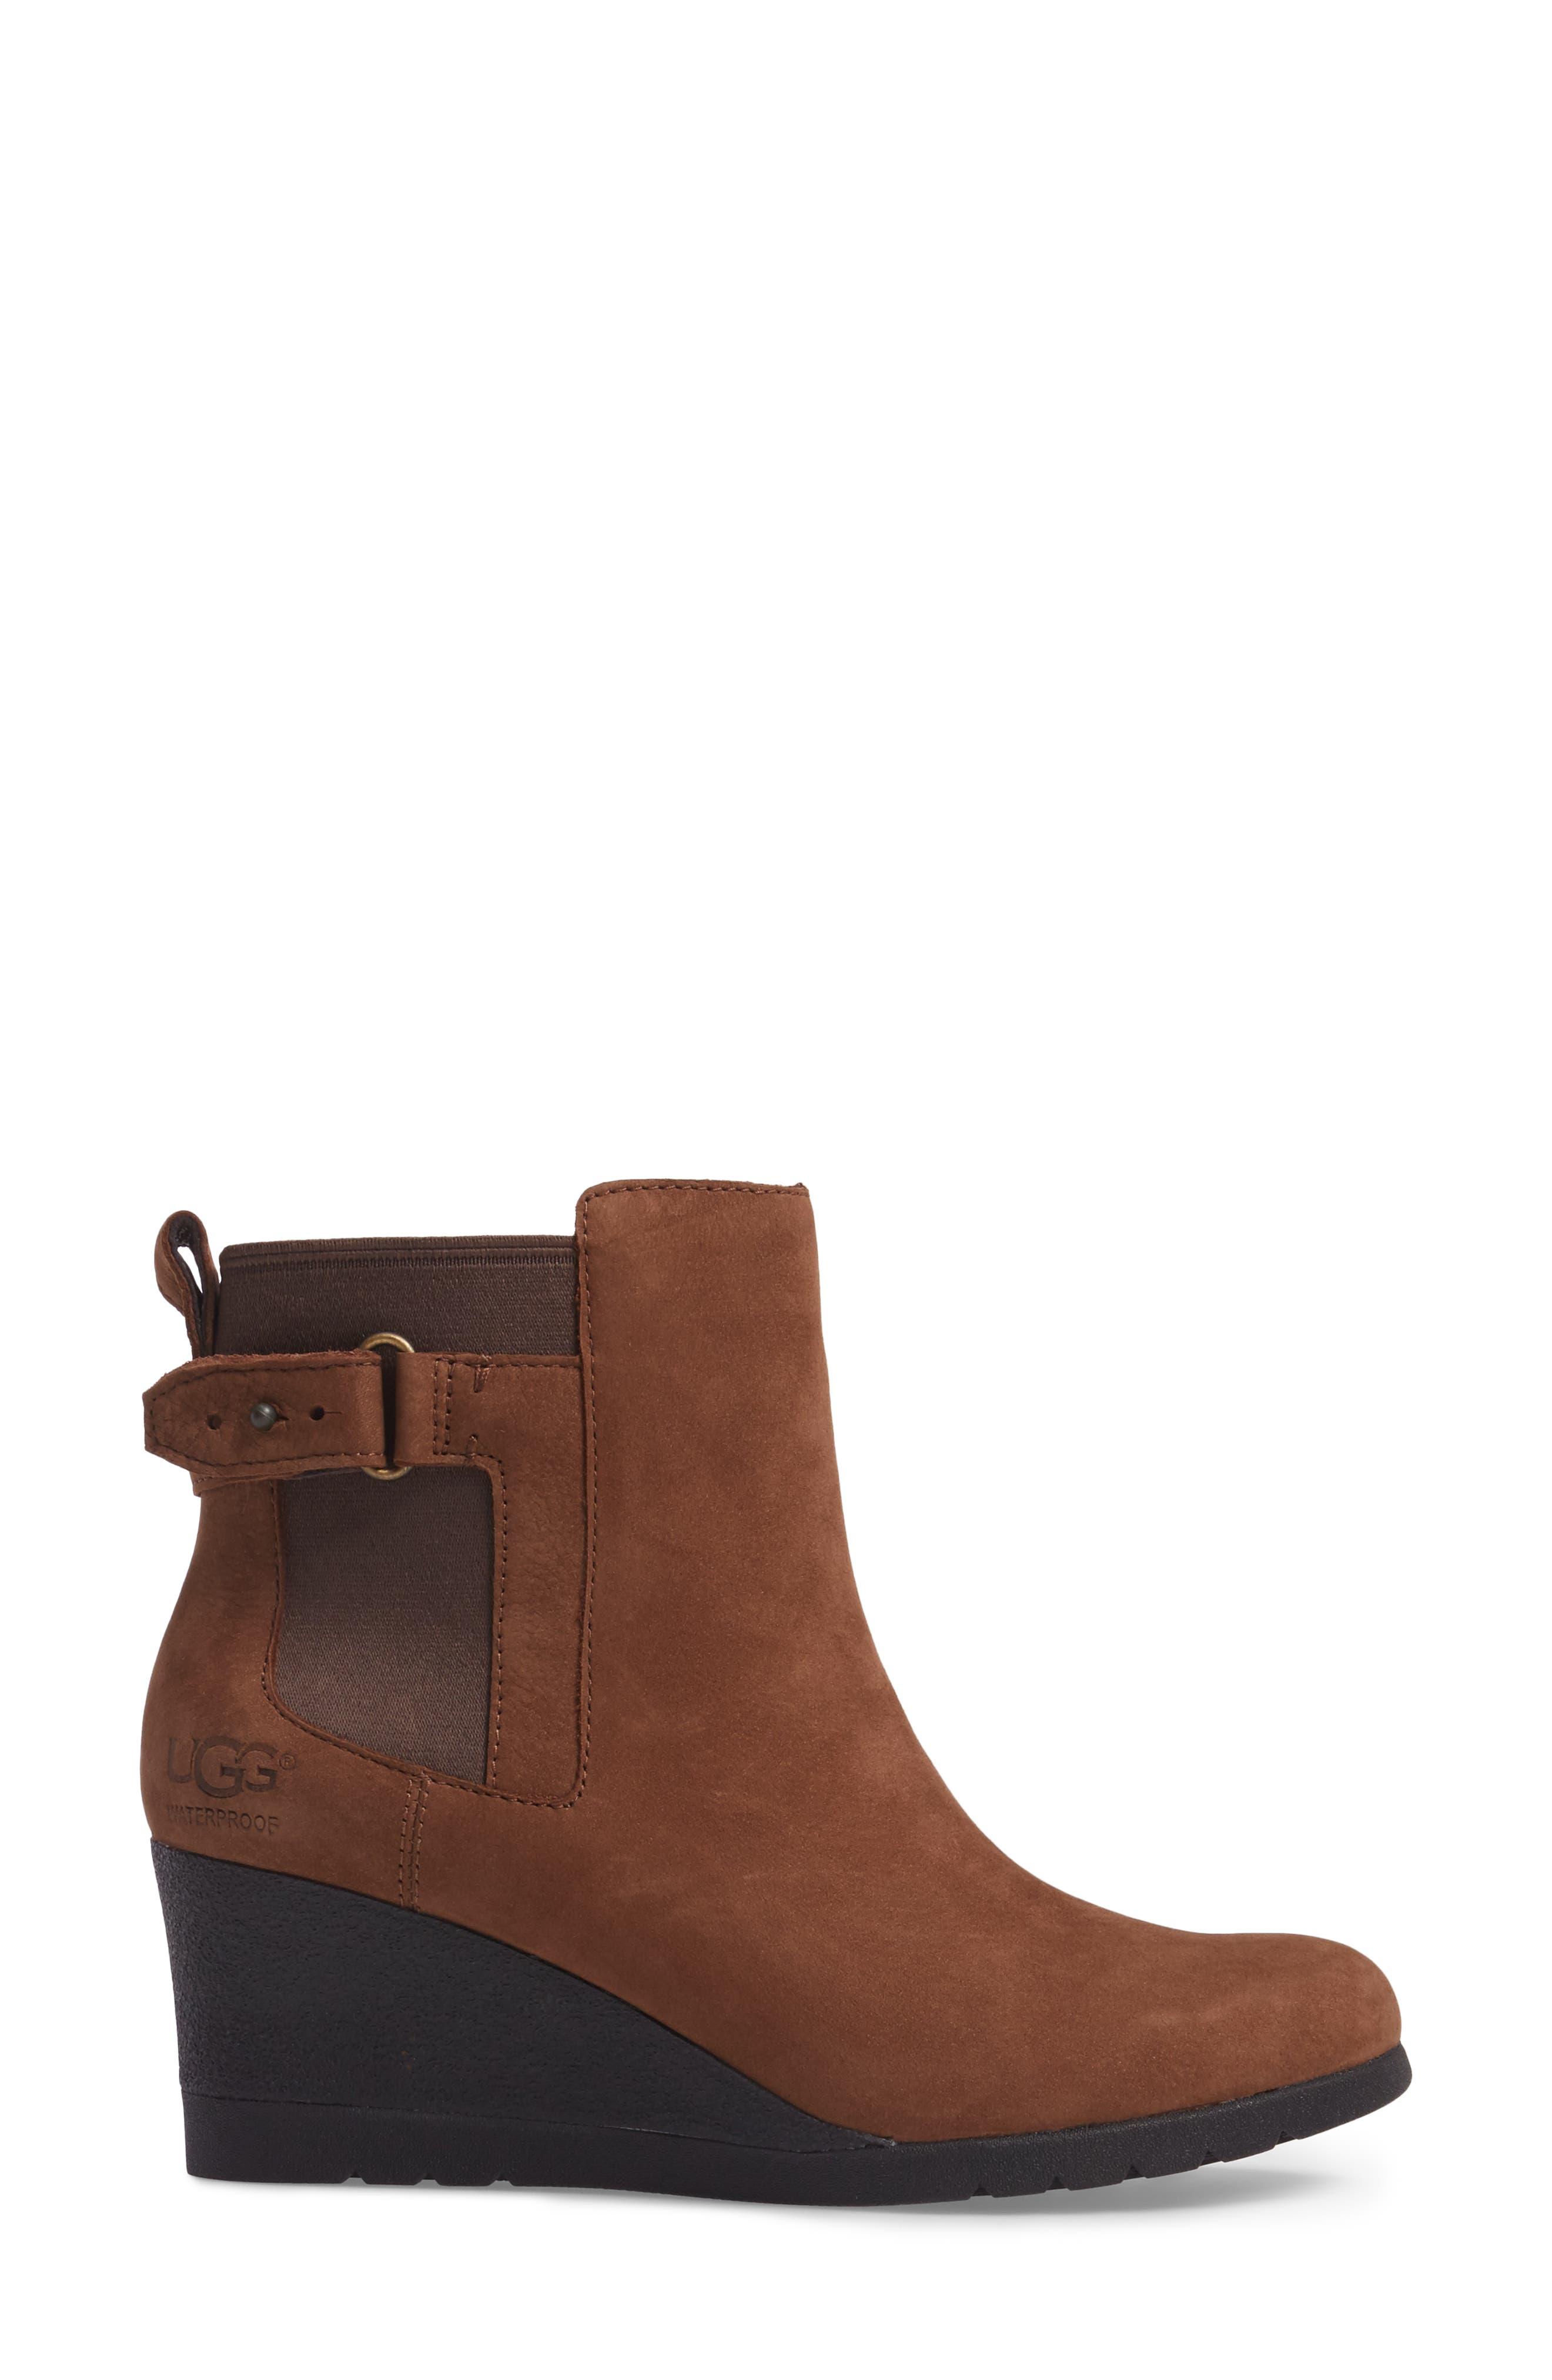 Alternate Image 3  - UGG® Waterproof Insulated Wedge Boot (Women)